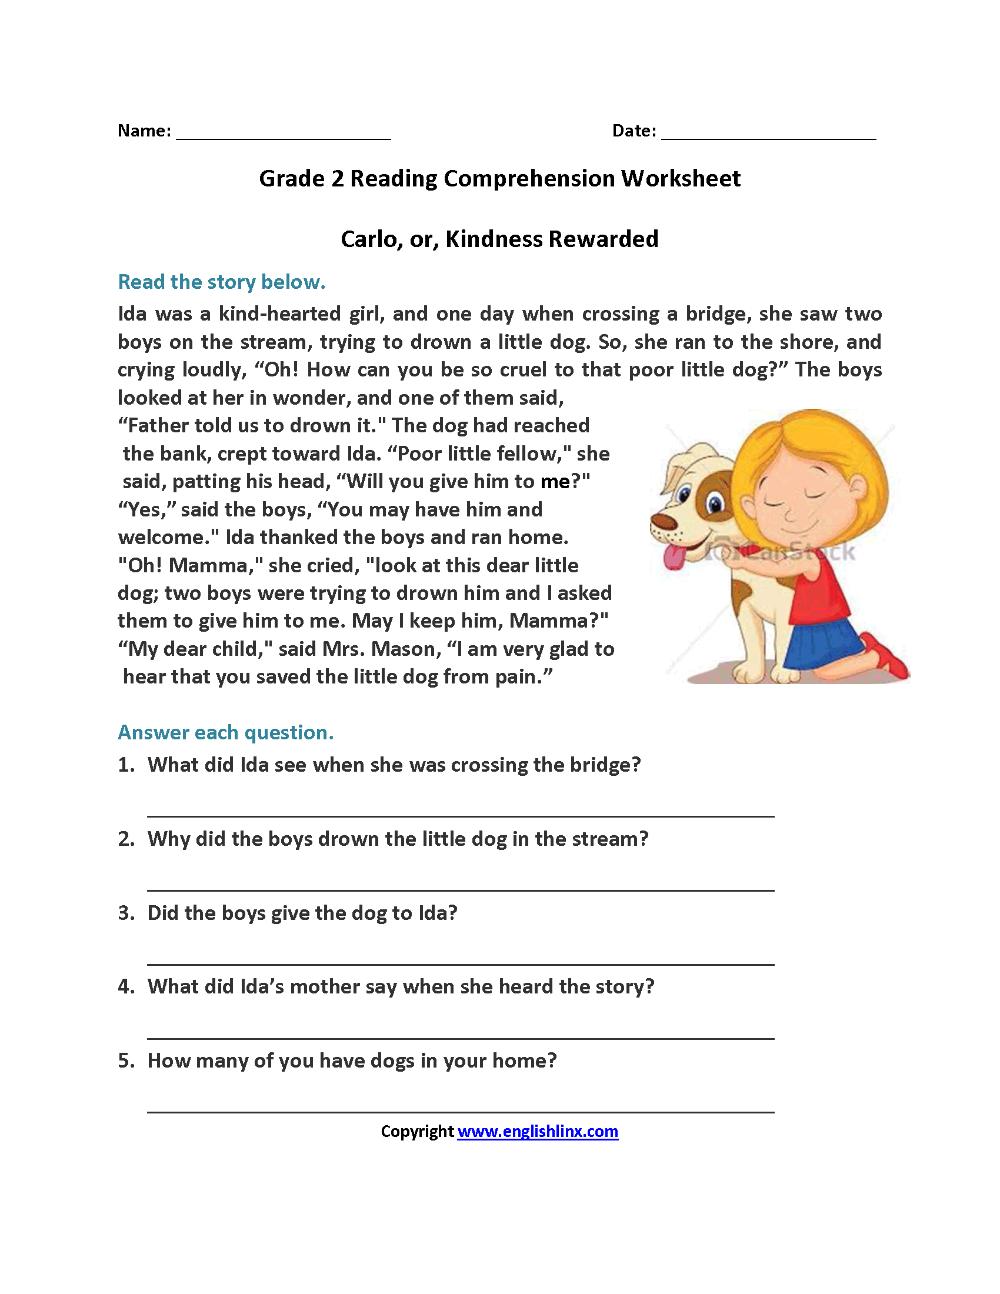 Reading Worksheets Second Grade Reading Worksheets 2nd Grade Reading Worksheets 3rd Grade Reading Comprehension Worksheets Reading Comprehension Worksheets